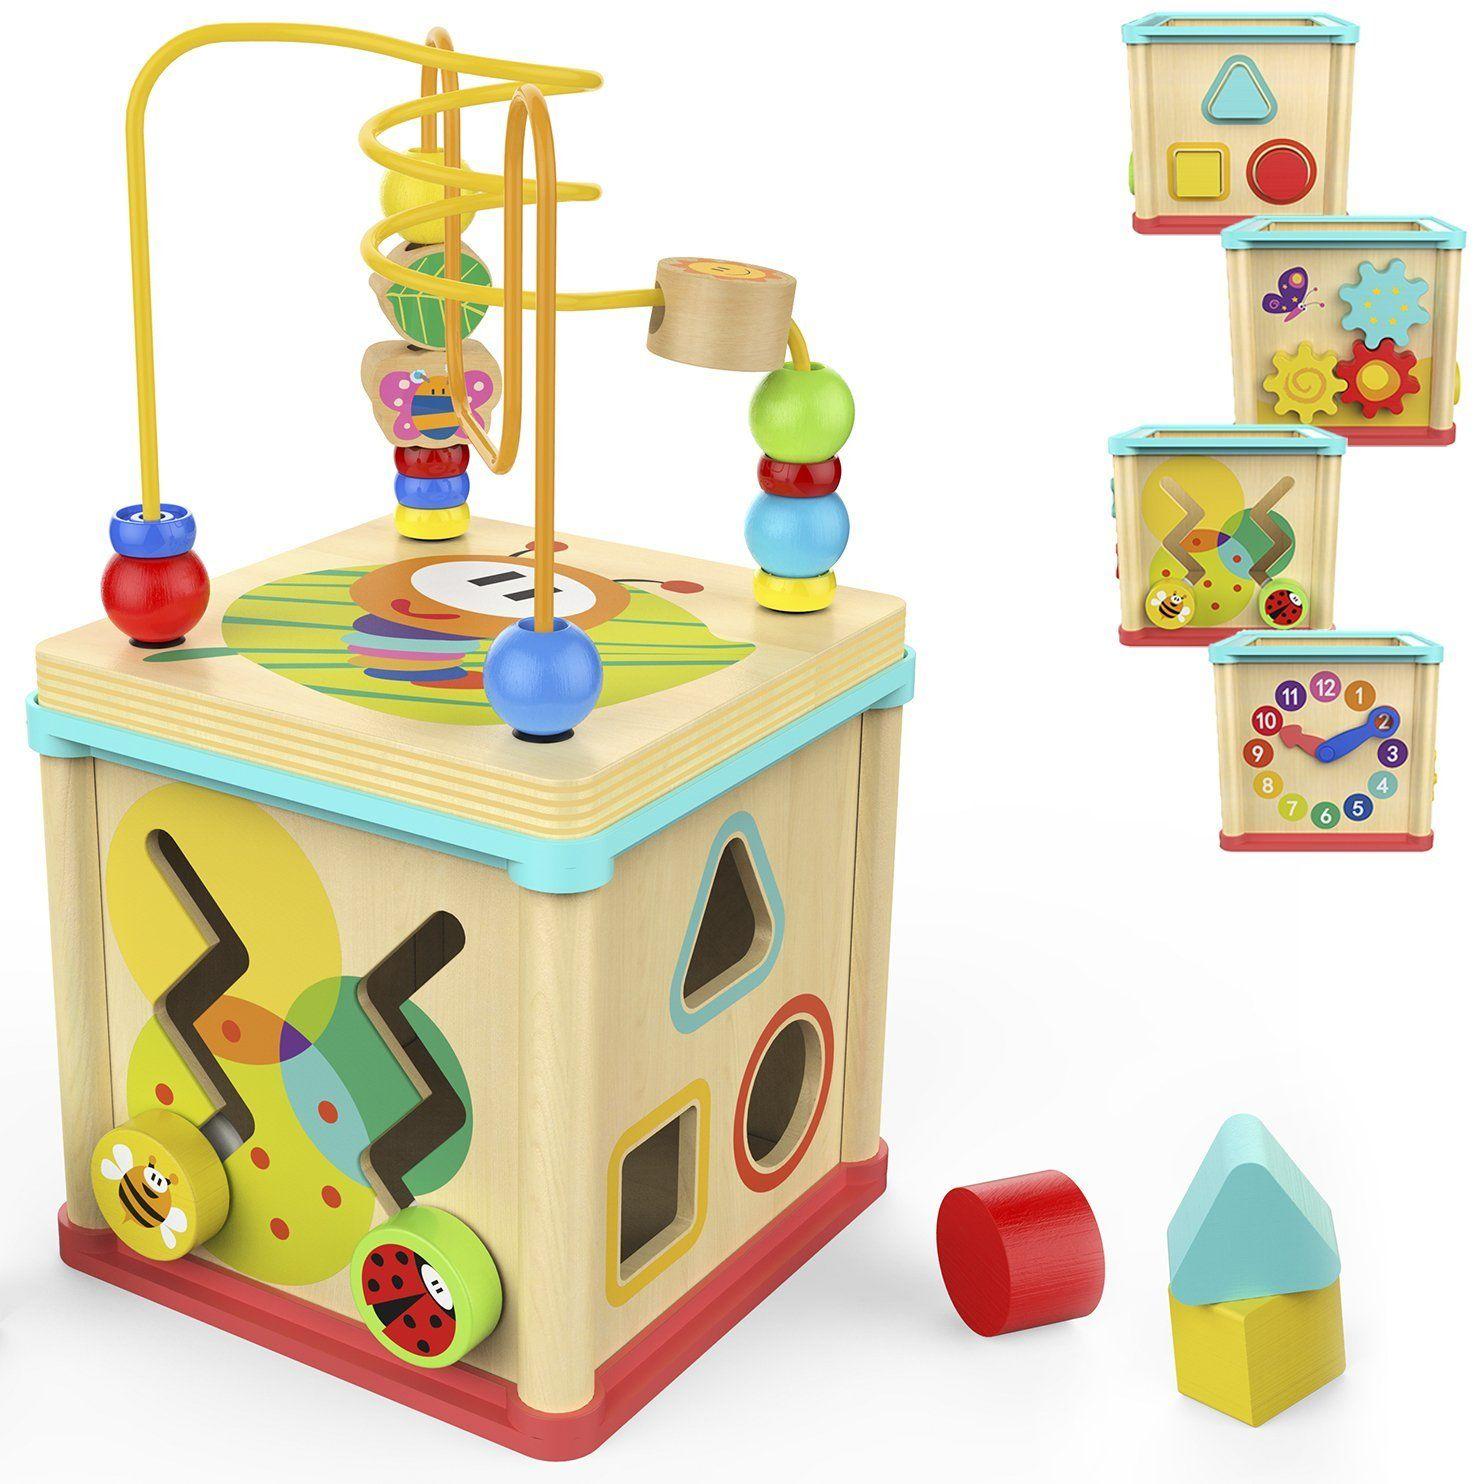 Amazon.com: TOP BRIGHT Activity Cube Toys Baby Educational ...